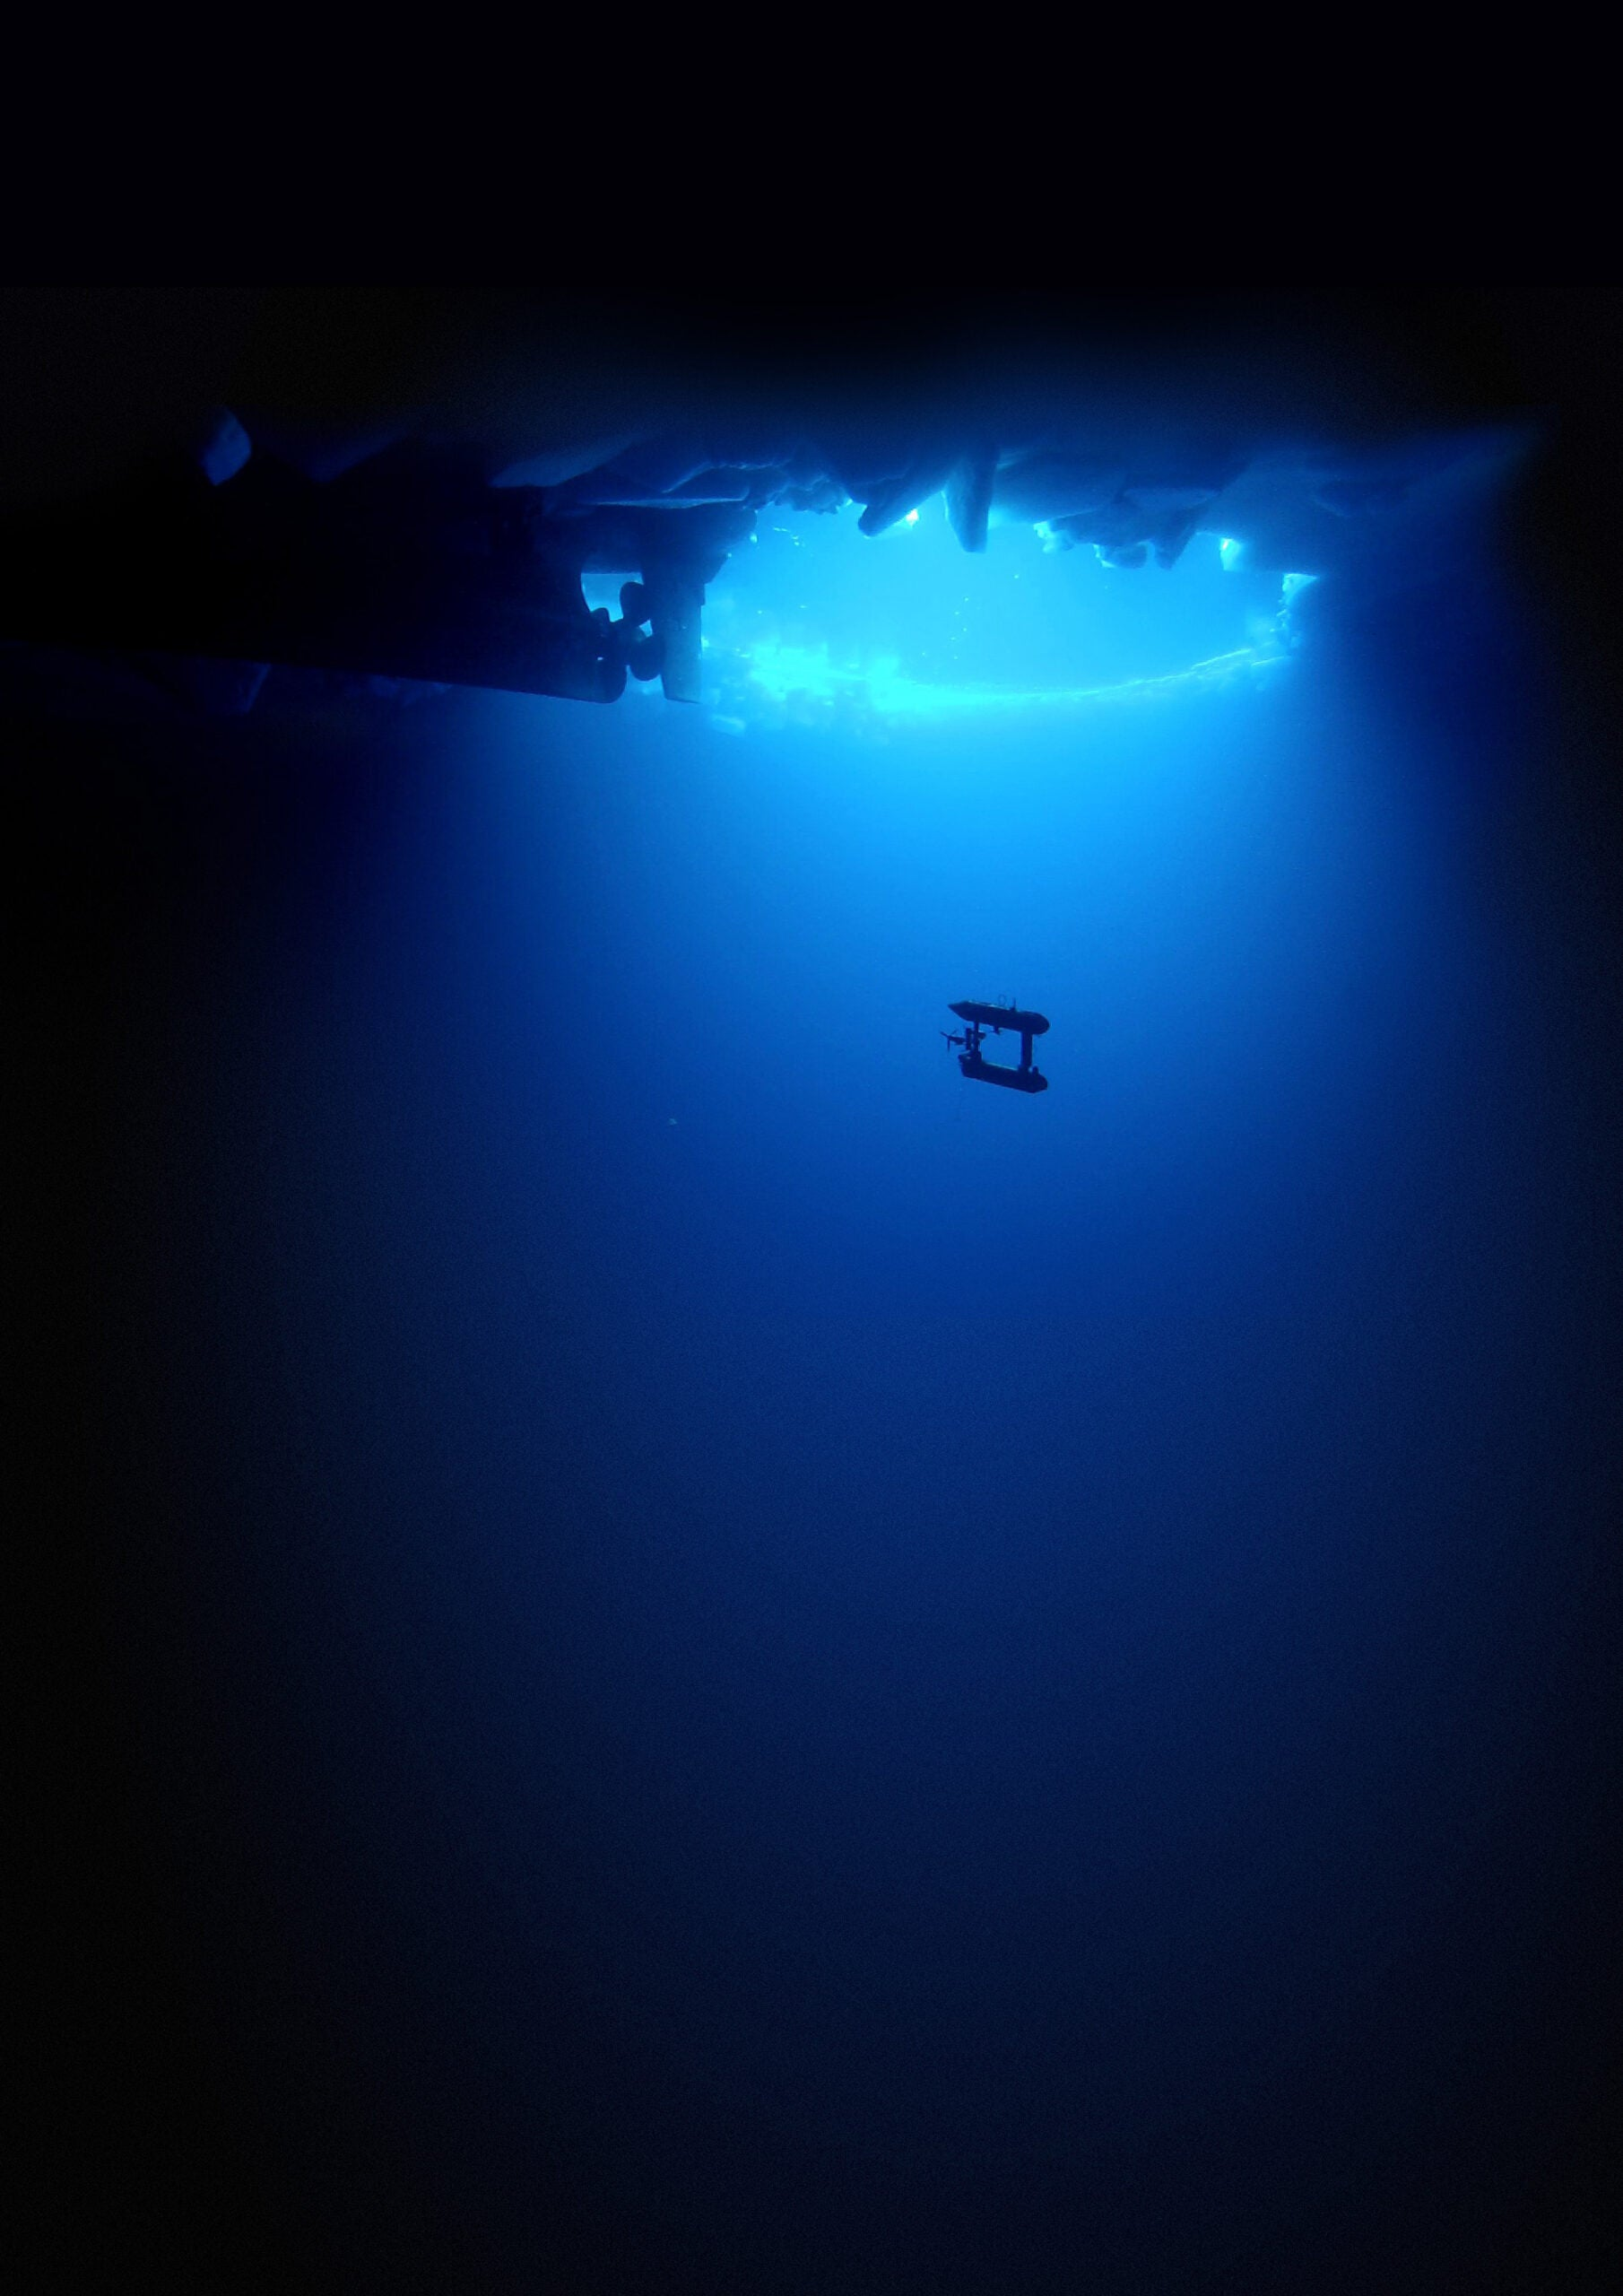 Underwater Robot Maps Polar Ice In 3-D